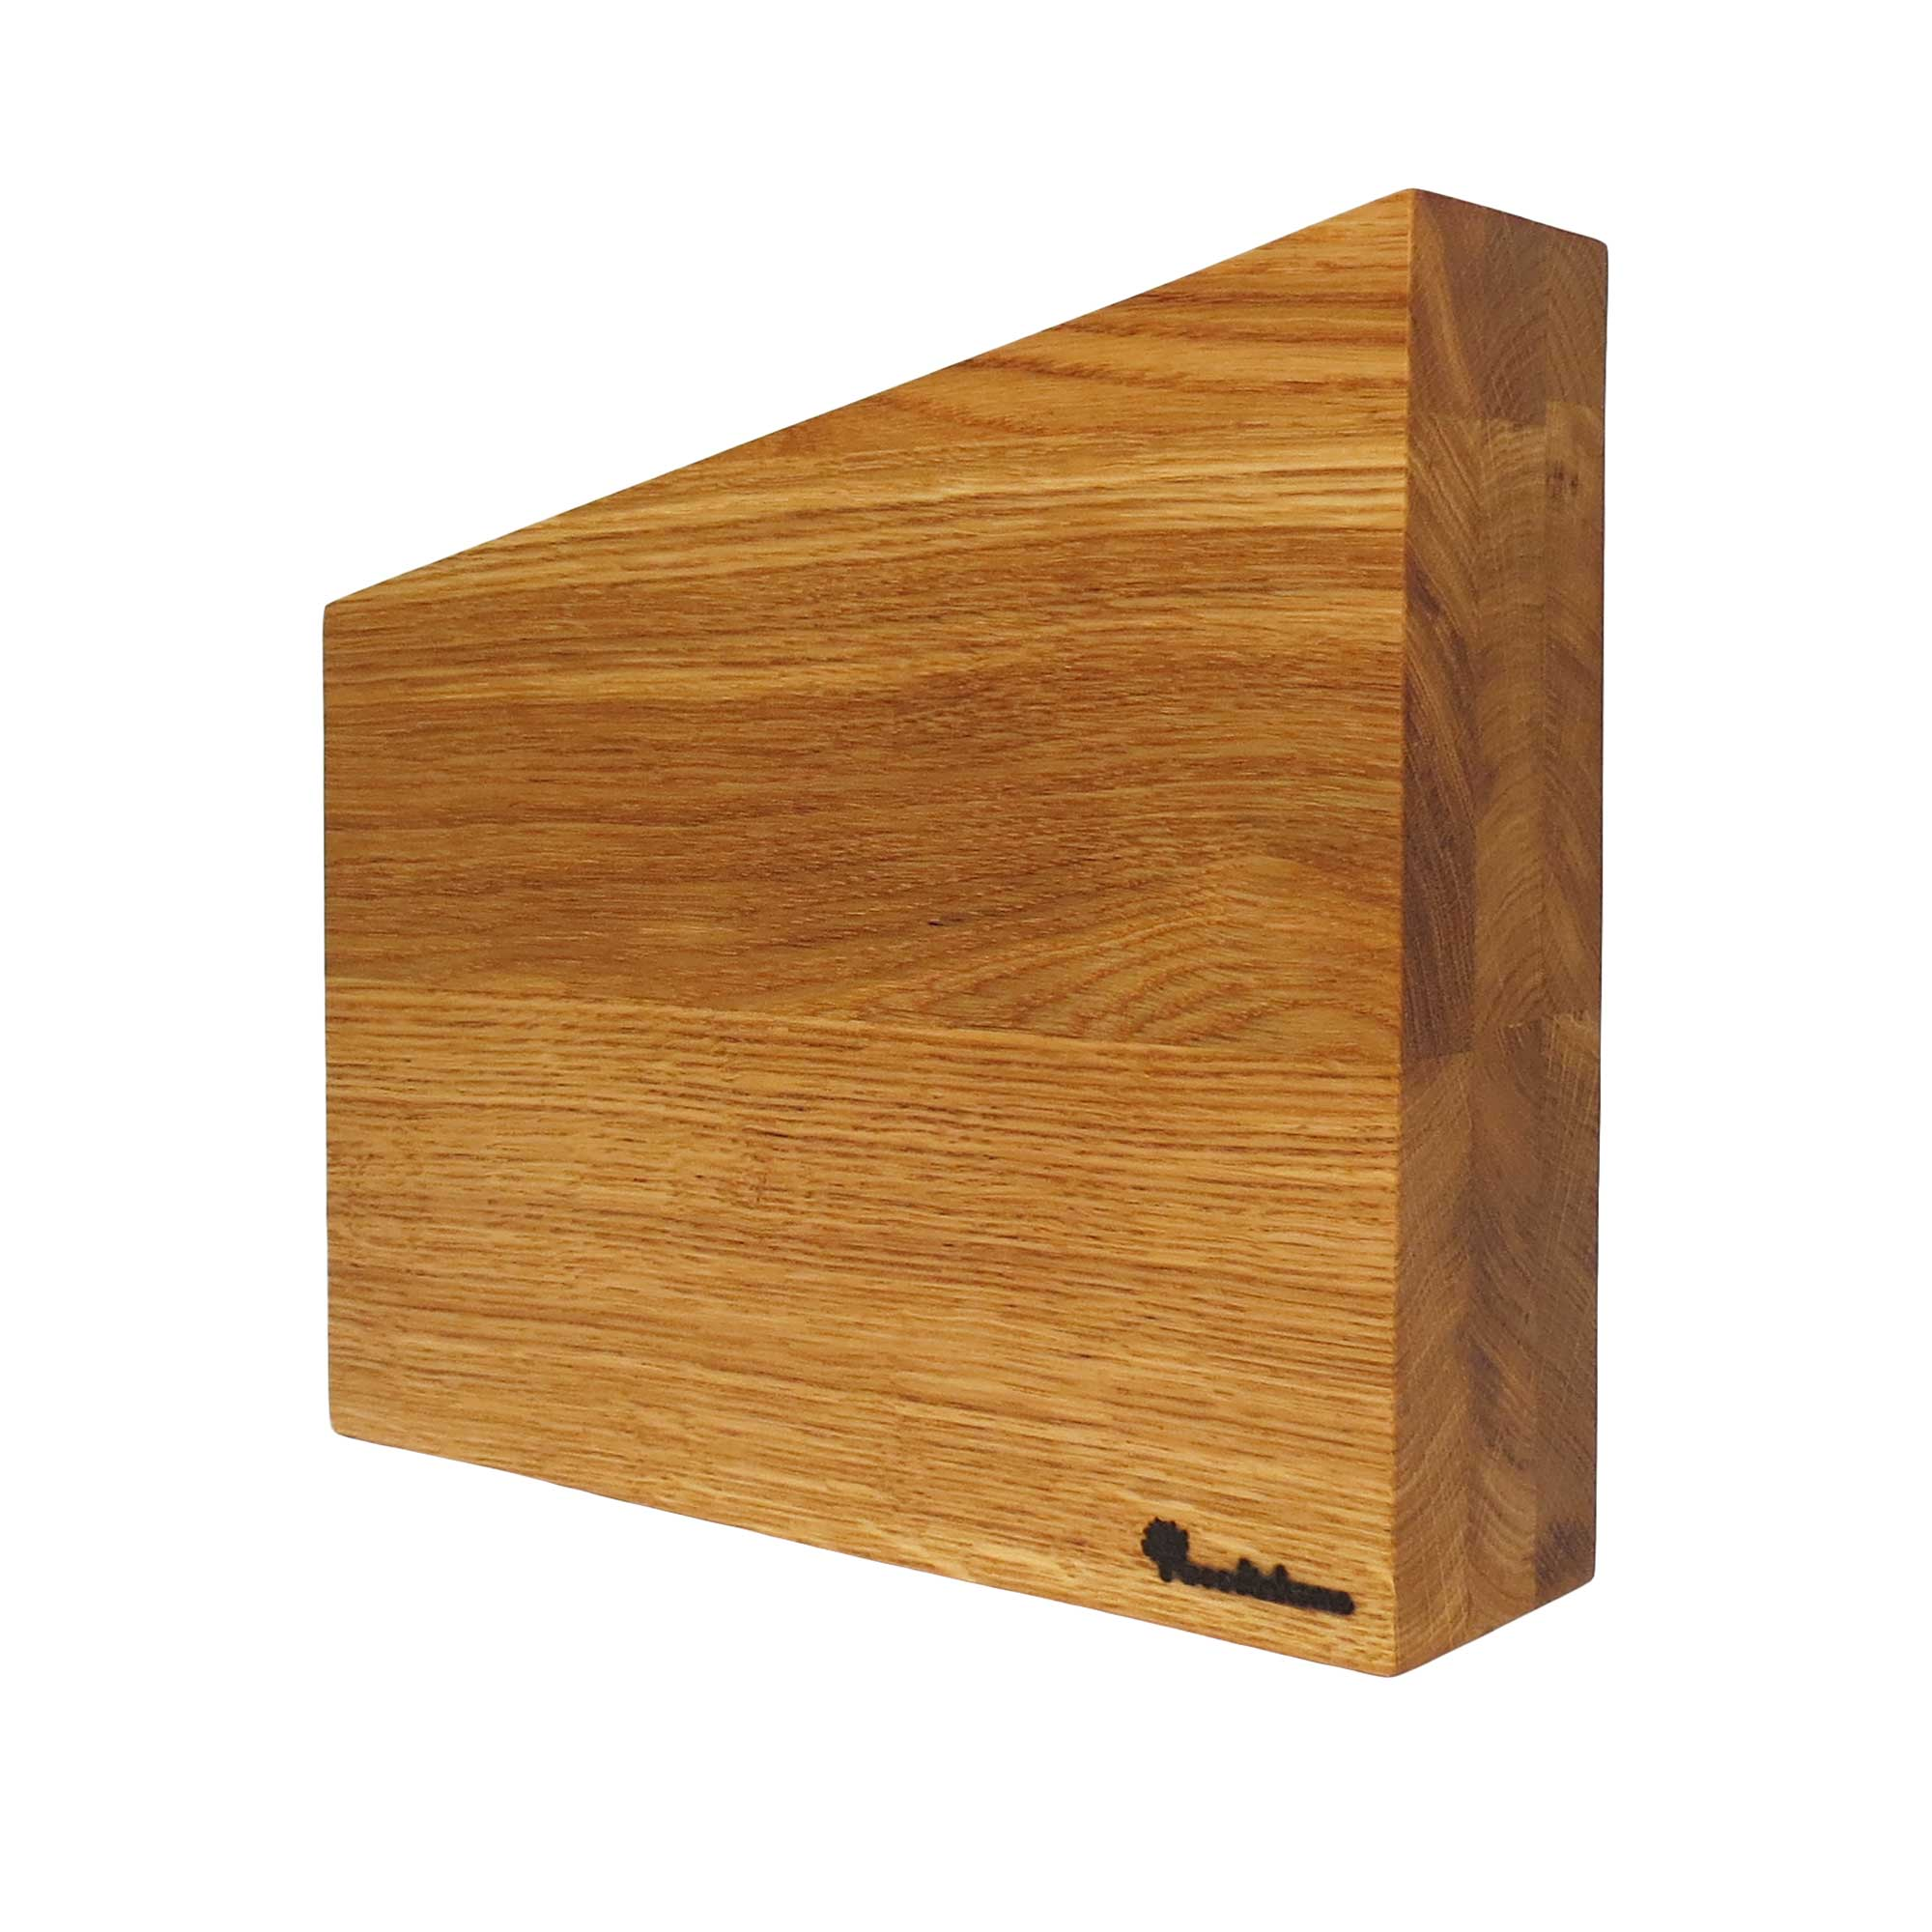 Подставка для ножей магнитнаяПосдтавка для ножей магнитная Woodinhome KS004SON, 8 ножей, дуб натур<br>